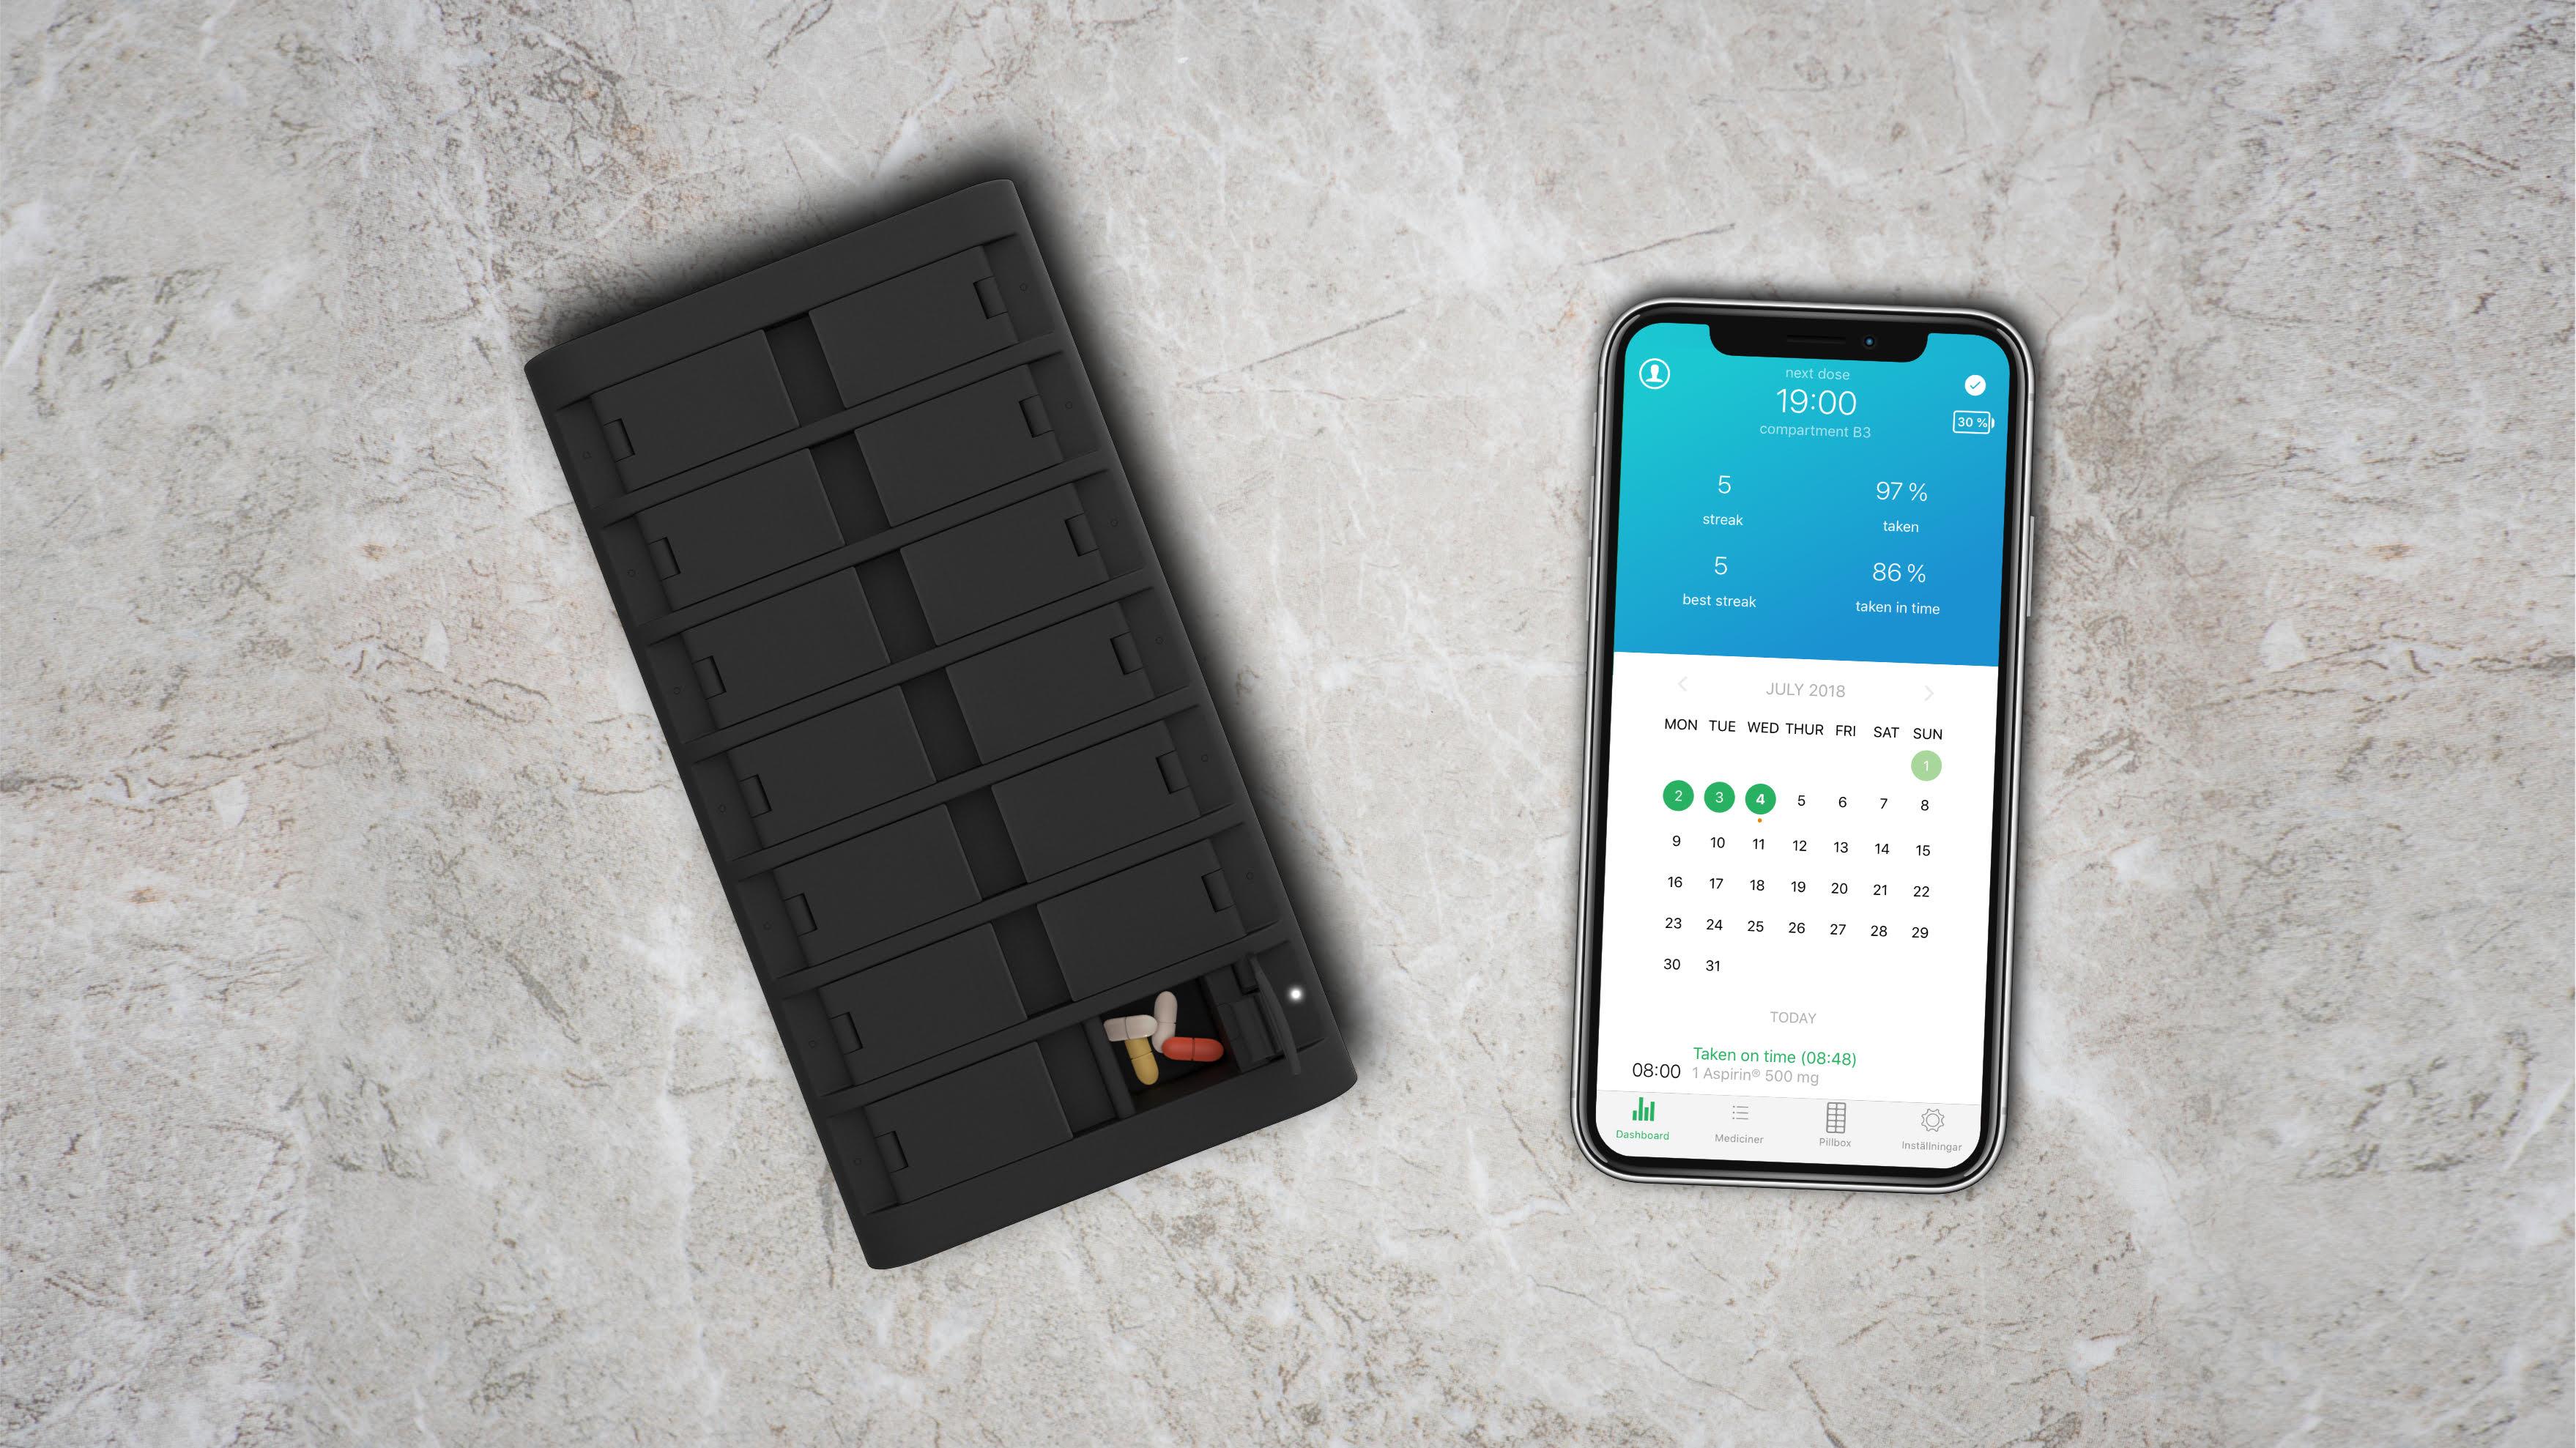 Sandoz to Use Pilloxa's Smart Pillbox to Improve Transplant Patient Medication Compliance